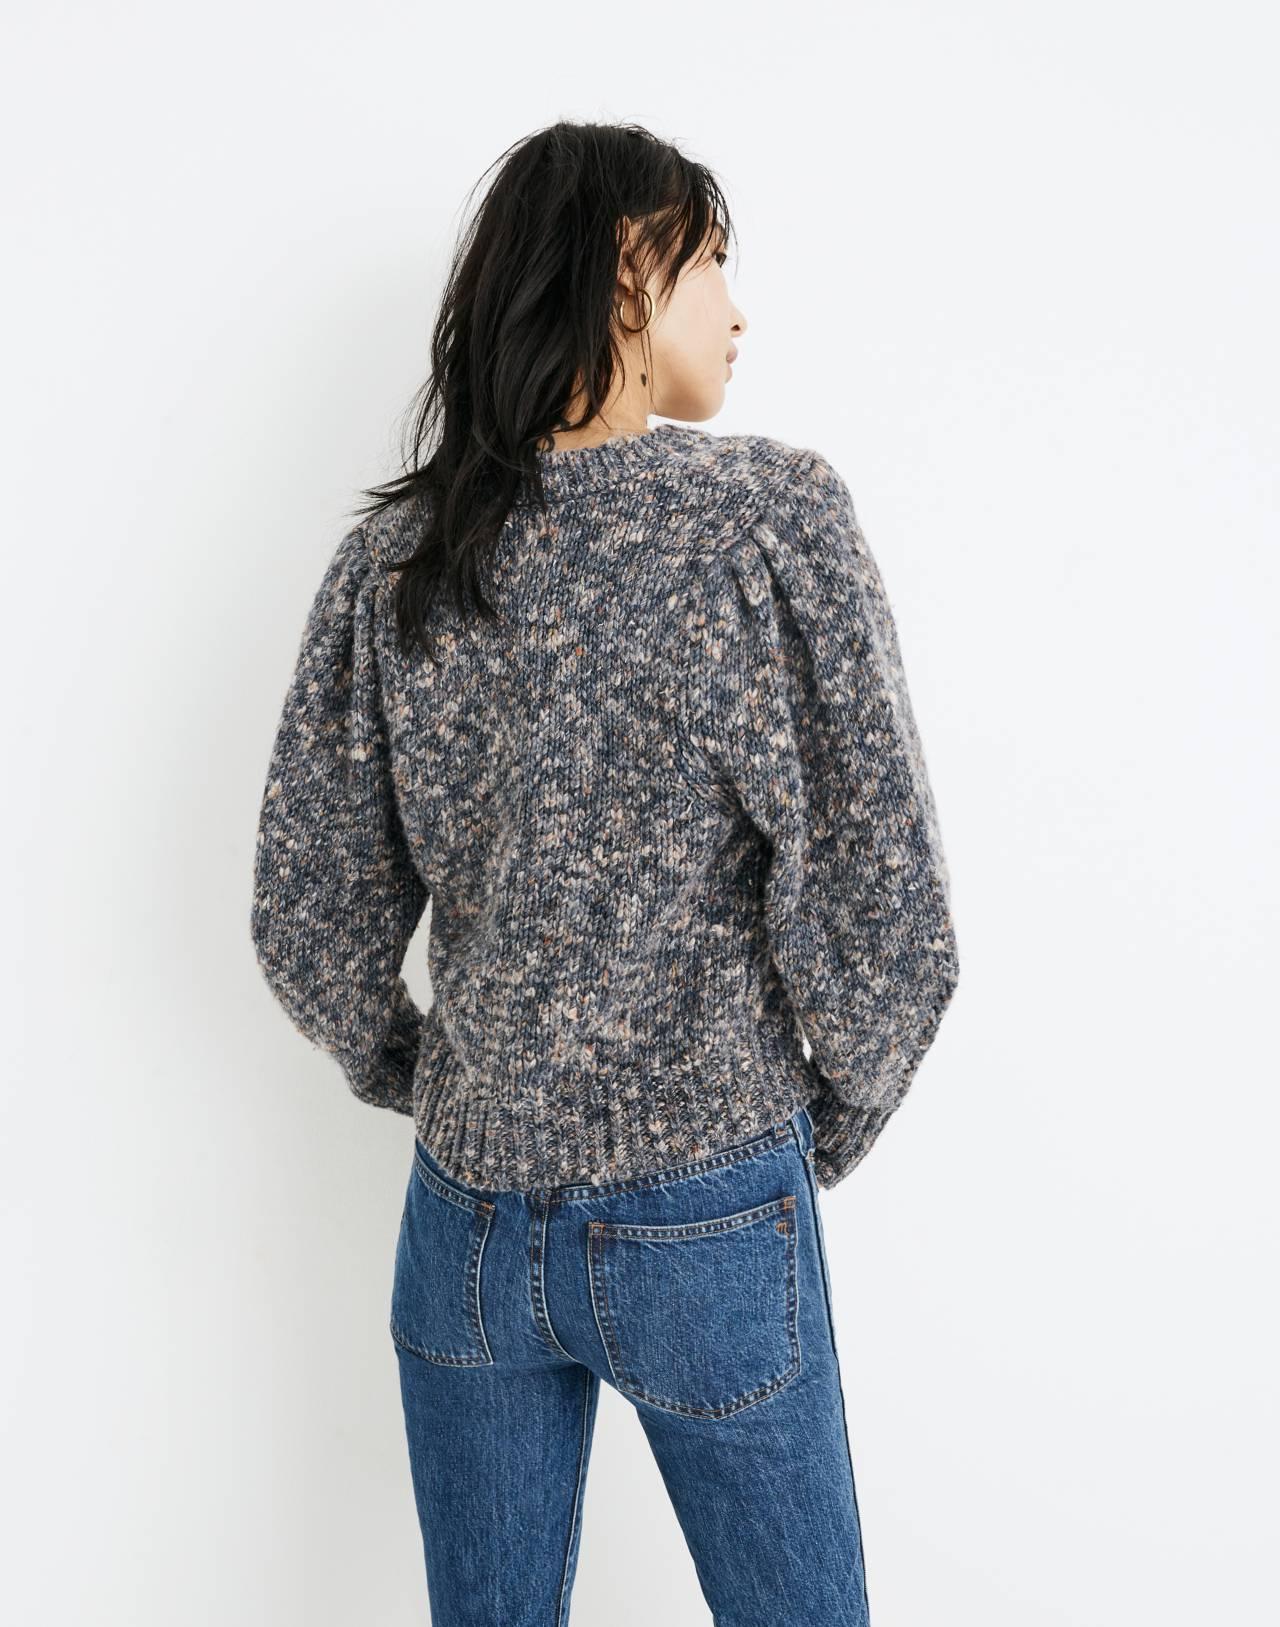 Pleat-Shoulder Pullover Sweater in marled indigo image 3